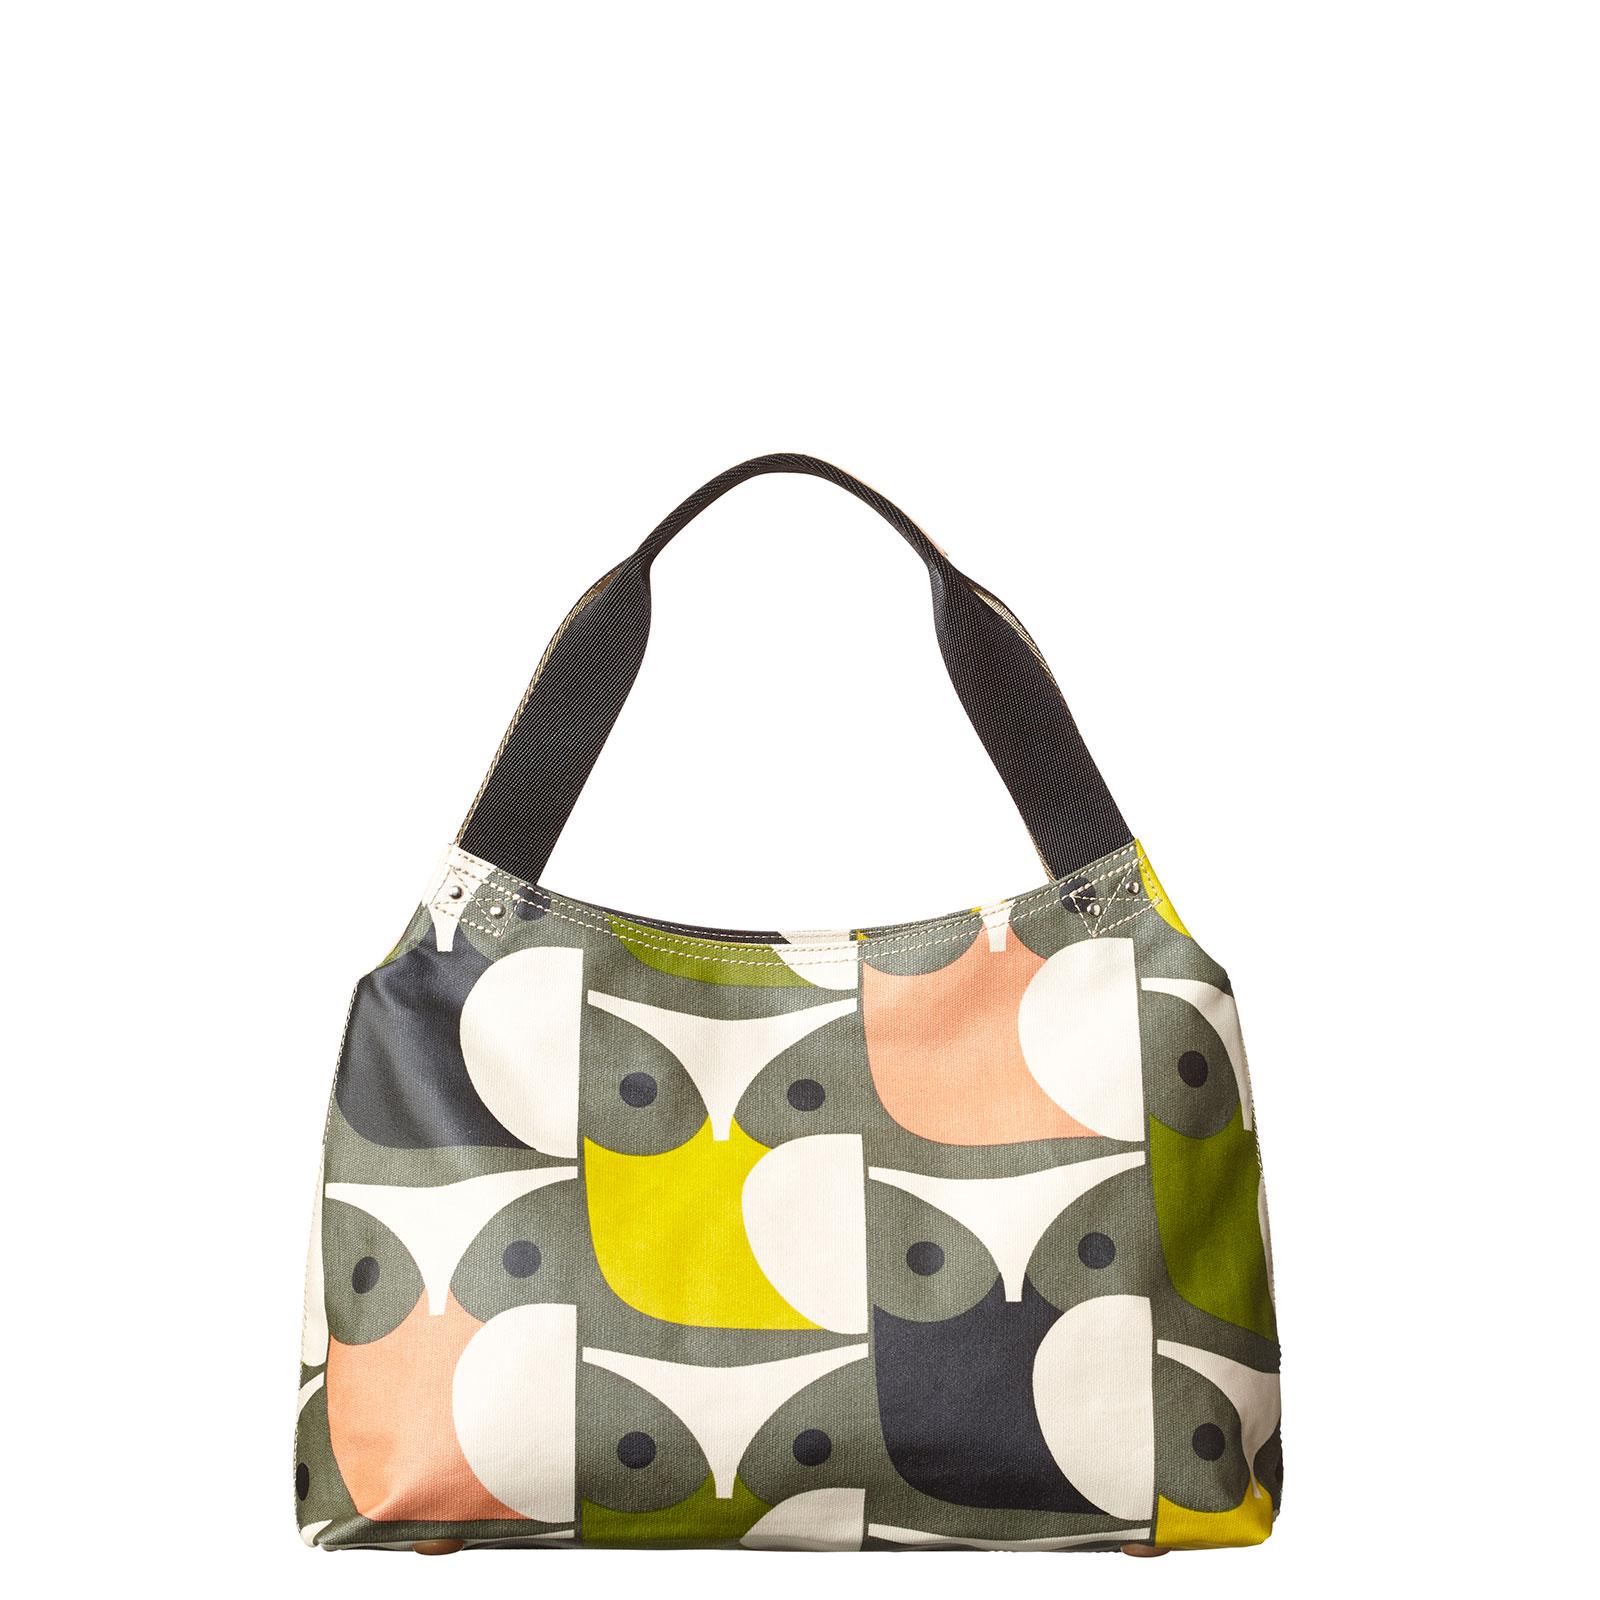 I Love Orla Kiely: Orla Kiely Big Owl Bags and Accessories